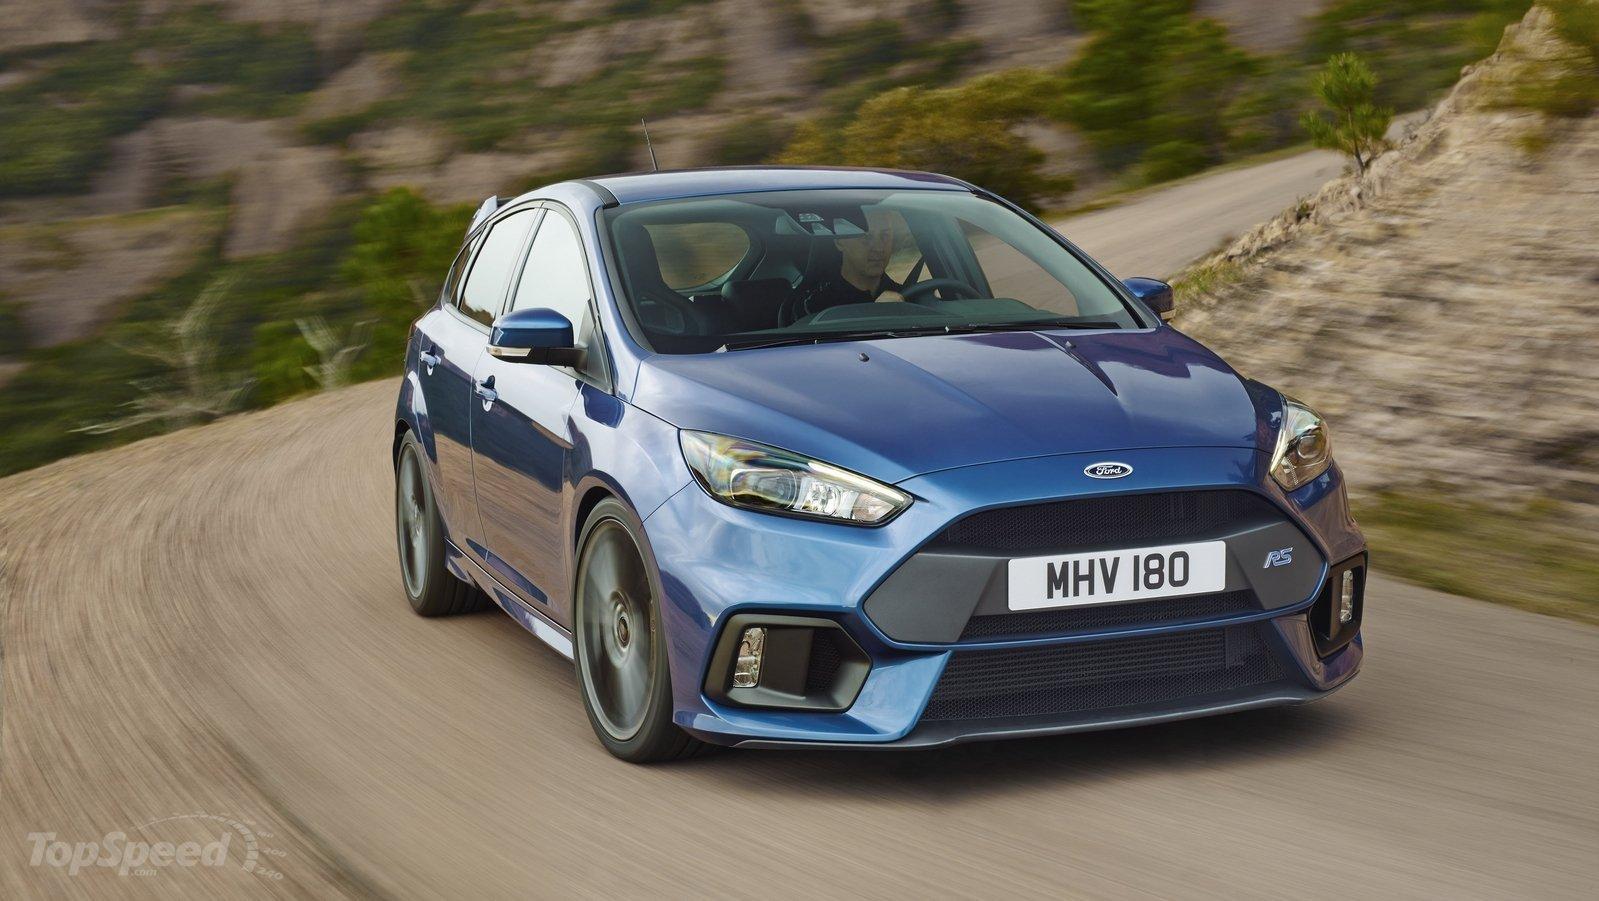 2016 Ford Focus 30 Background Wallpaper Car Hd Wallpaper